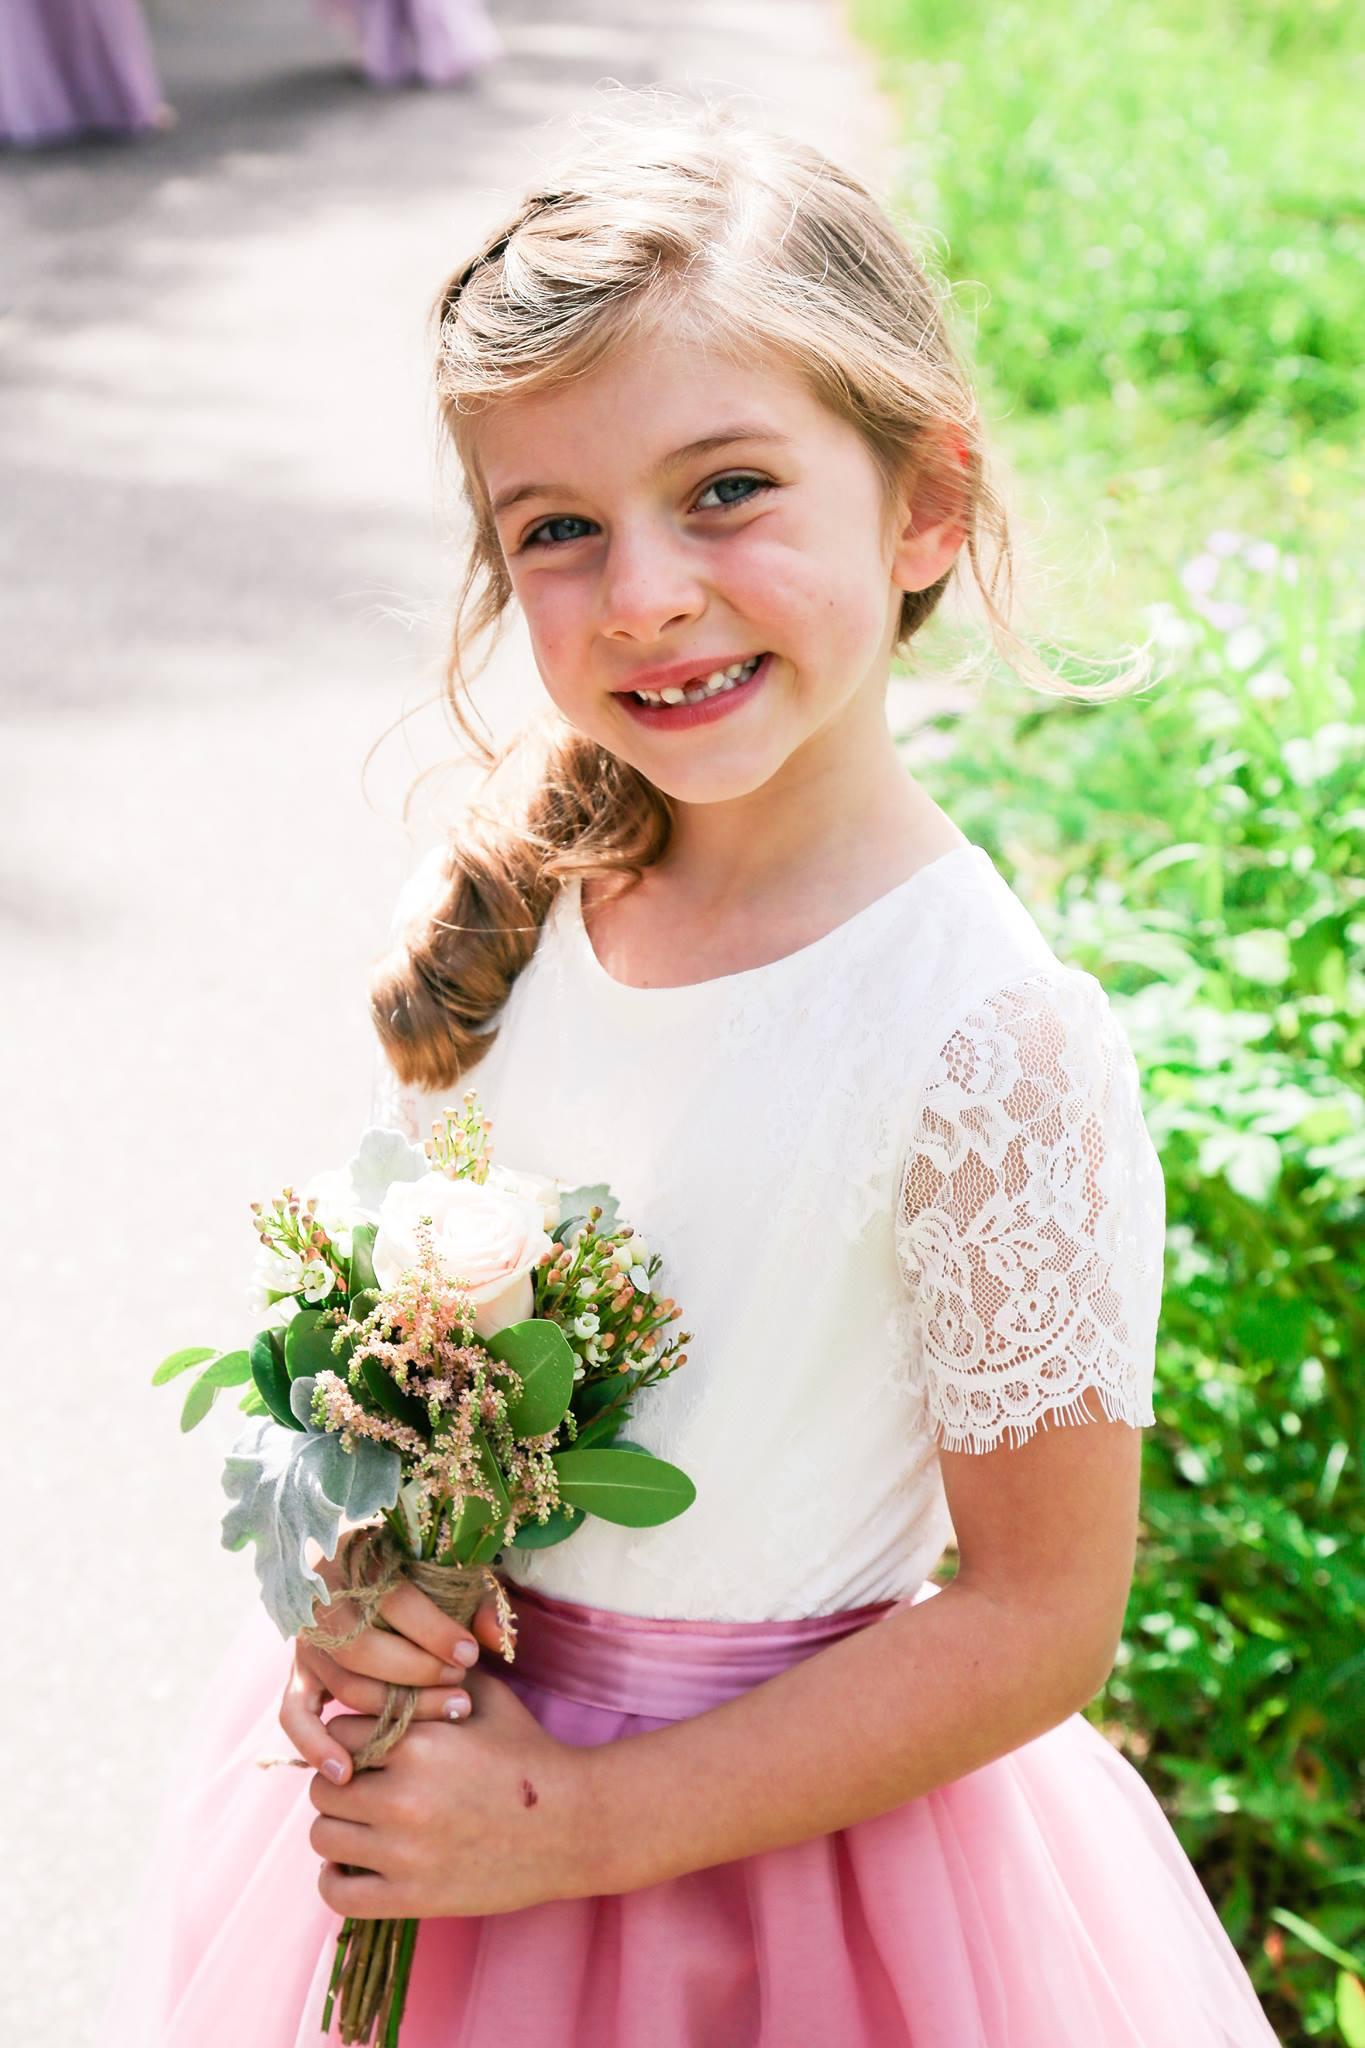 Tulle with Flower Girls Boquet